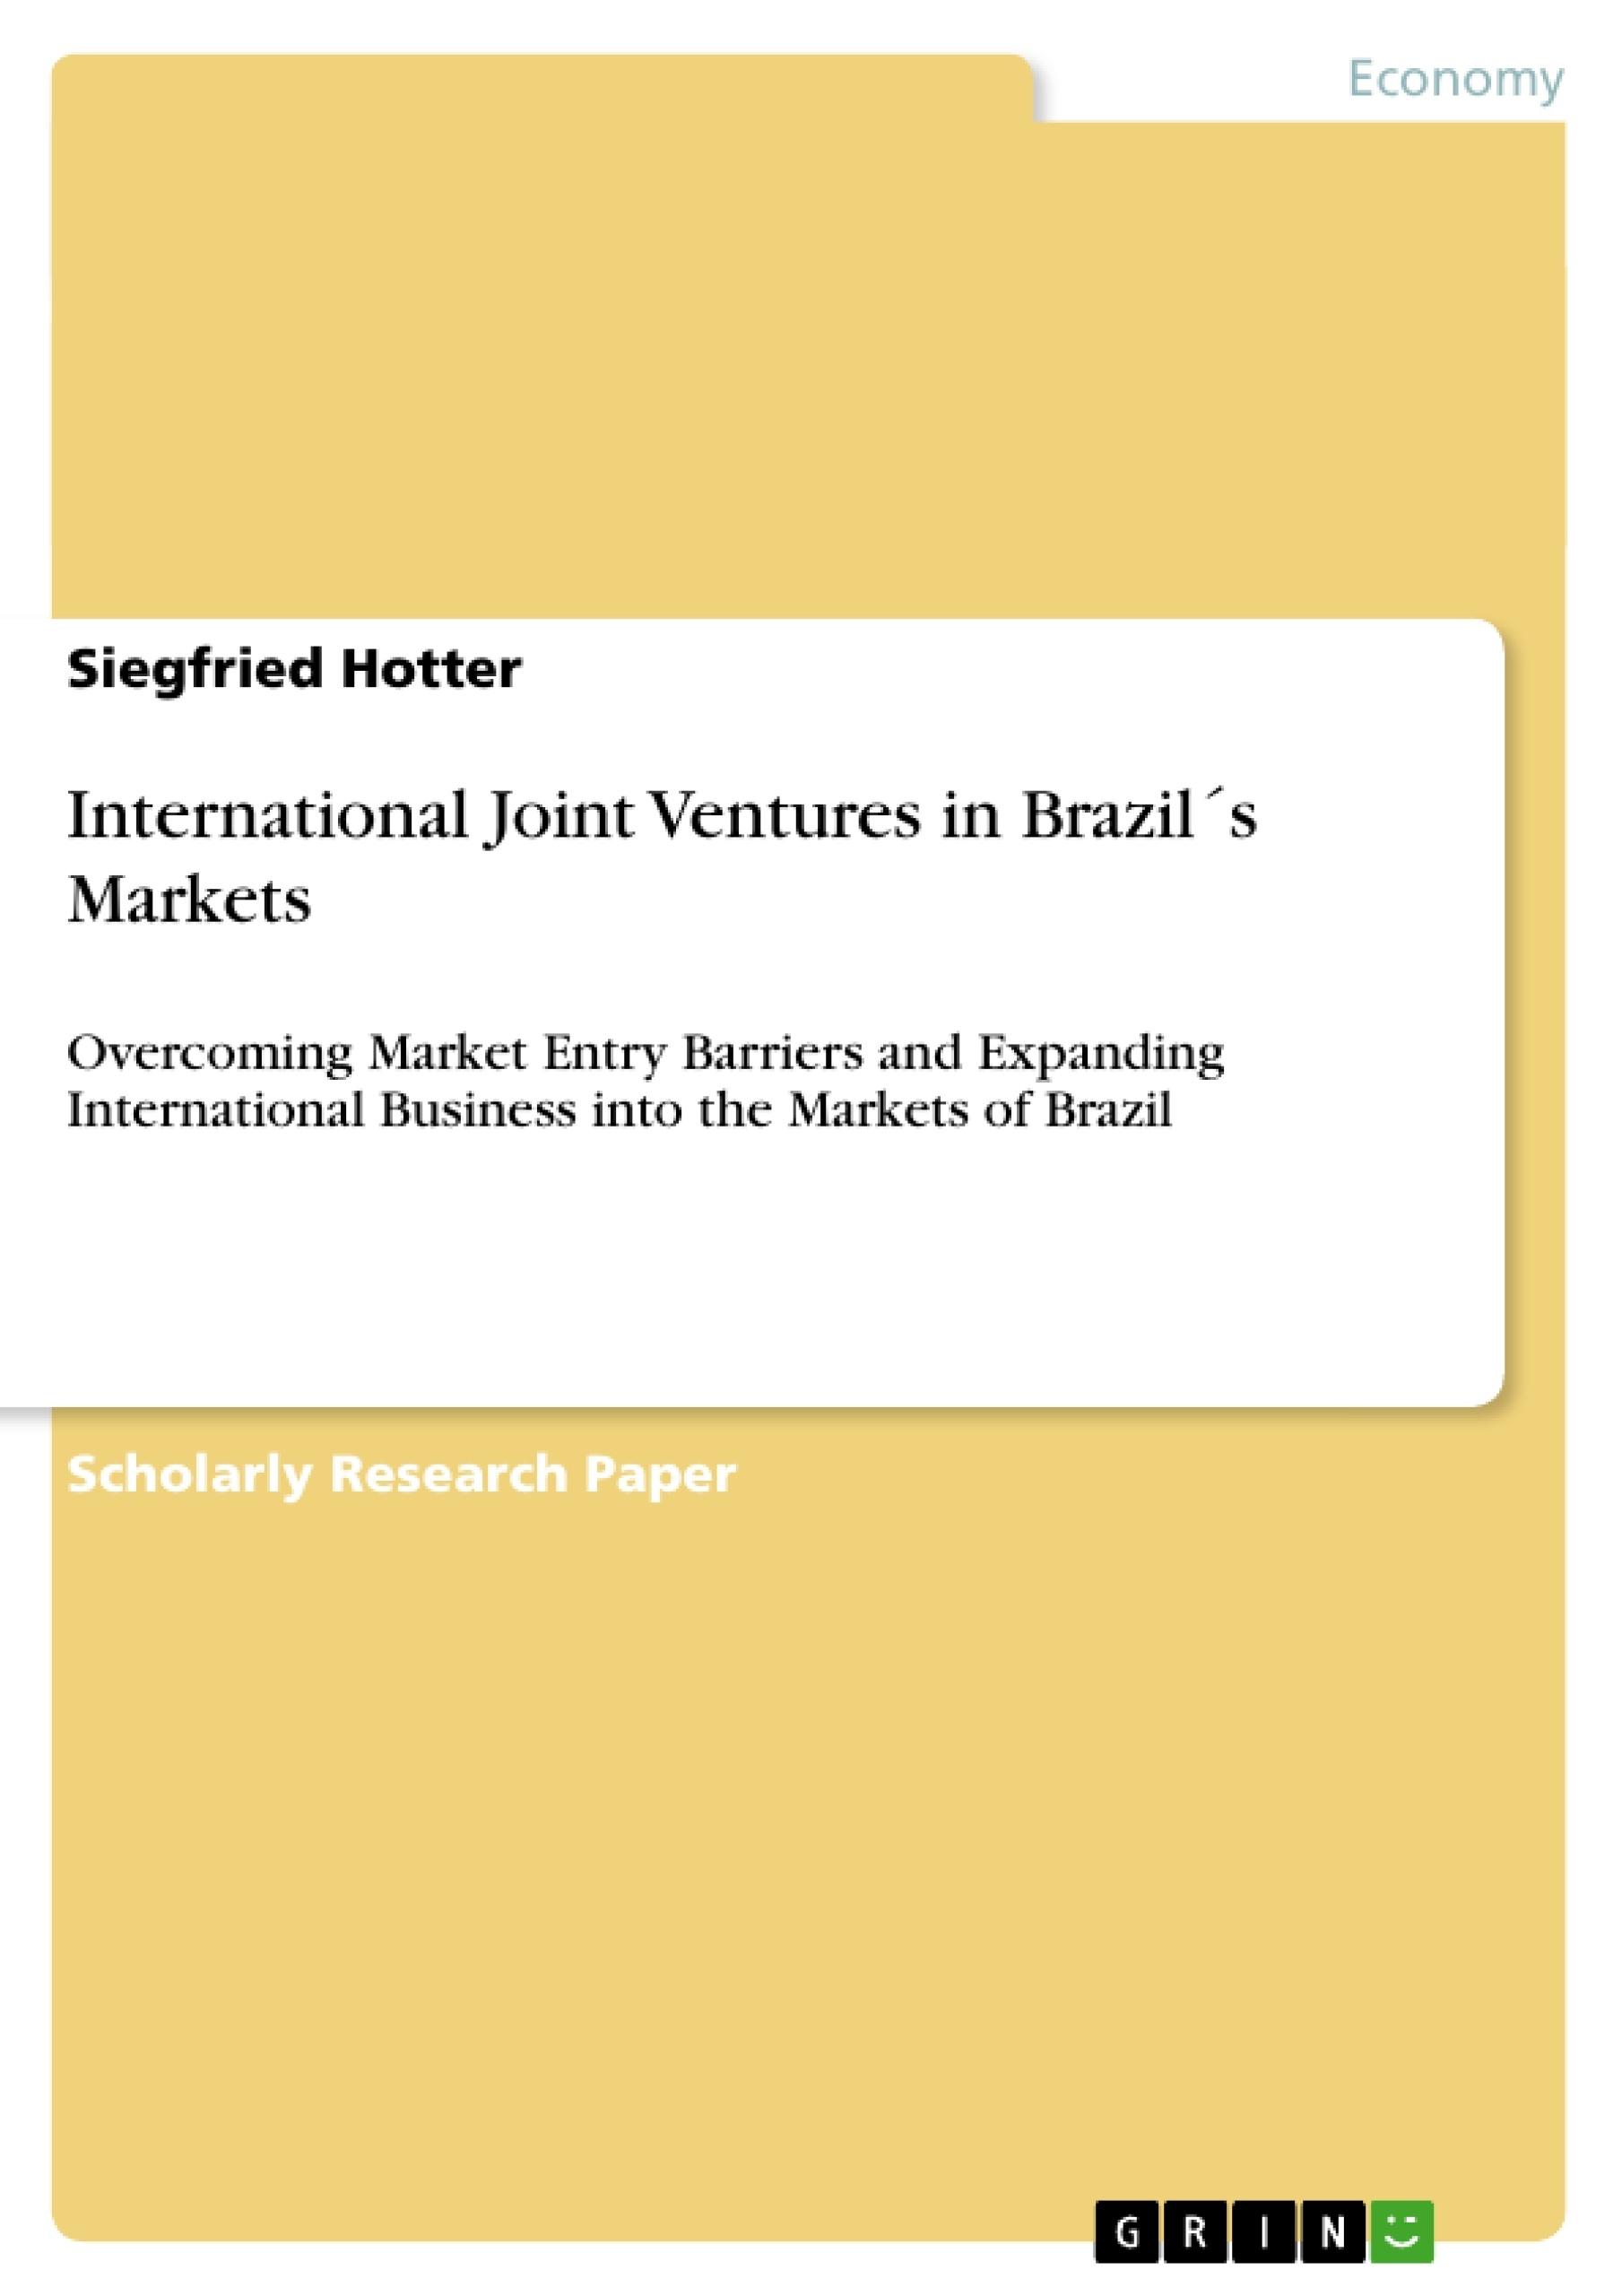 Title: International Joint Ventures in Brazil´s Markets